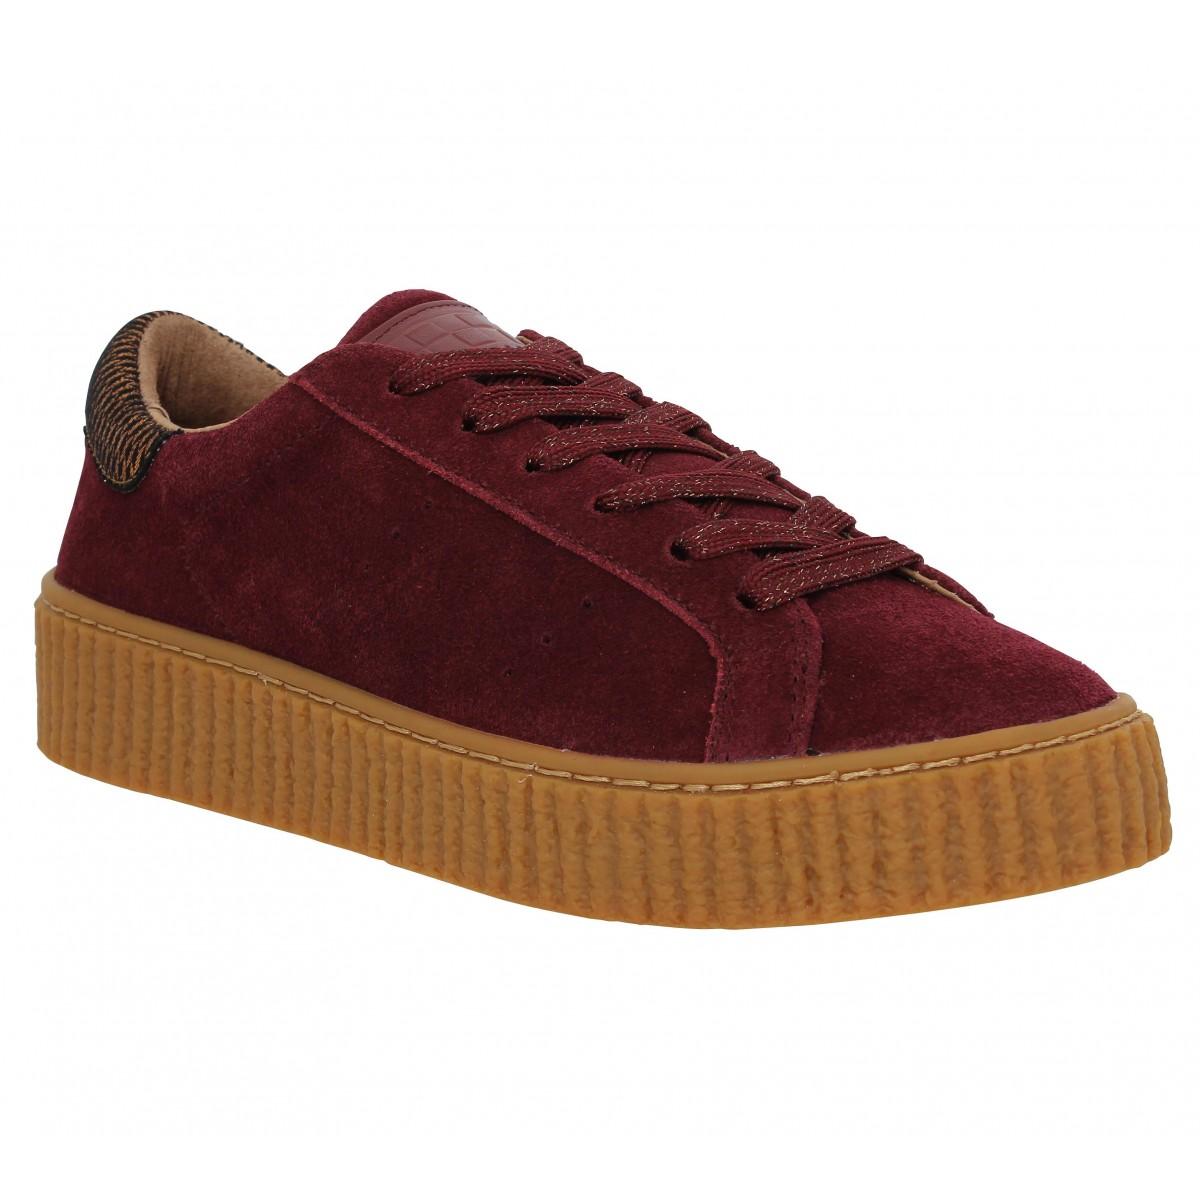 Picadilly Sneaker No Bordeaux Name Bordeaux Name Name No Picadilly Sneaker No yb7g6f